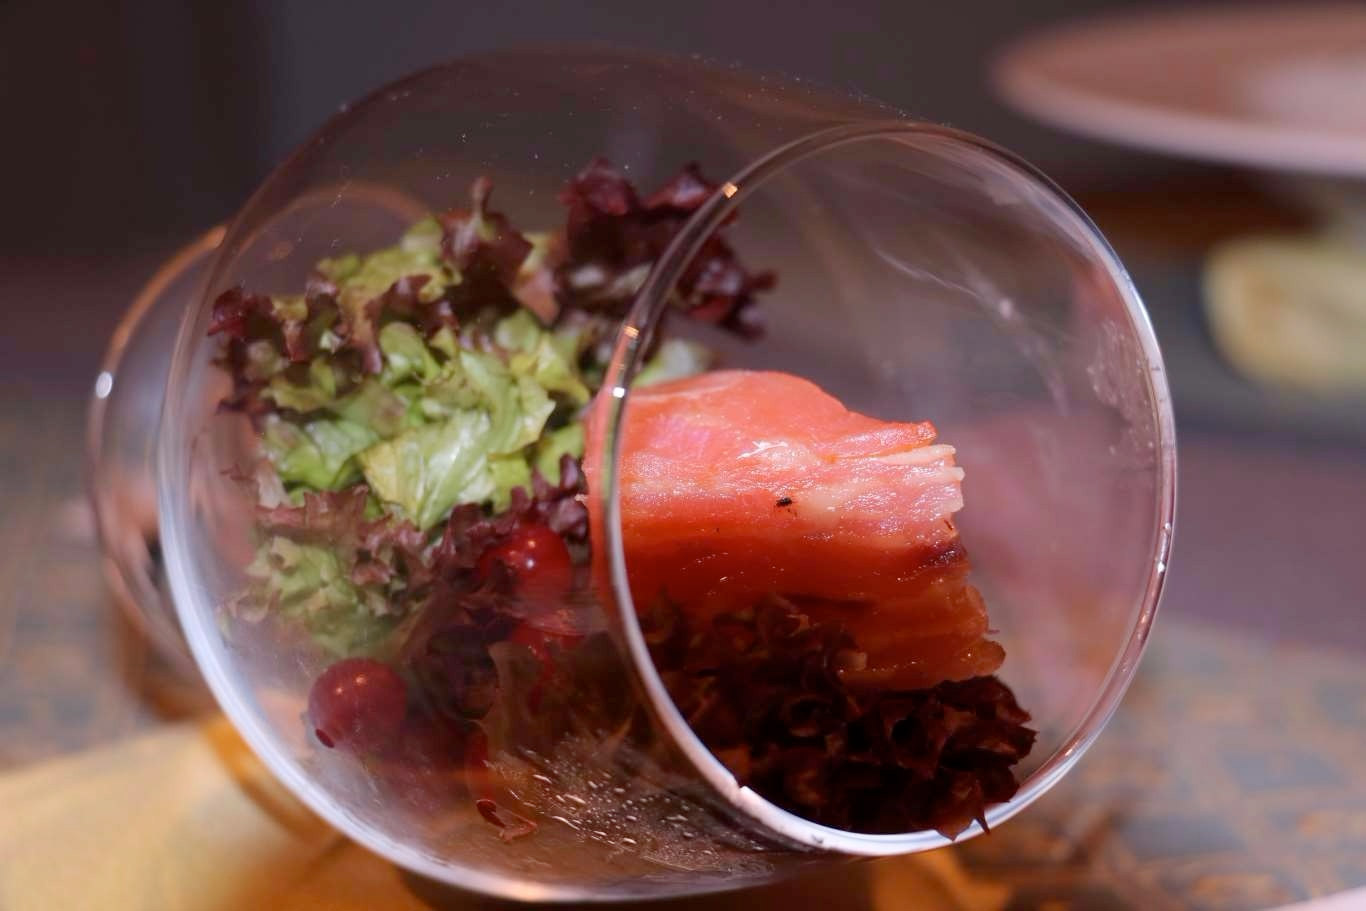 XXXI Semana Gastronómica de Alcalá de Henares - Dream Alcalá 4f3ca7a30702